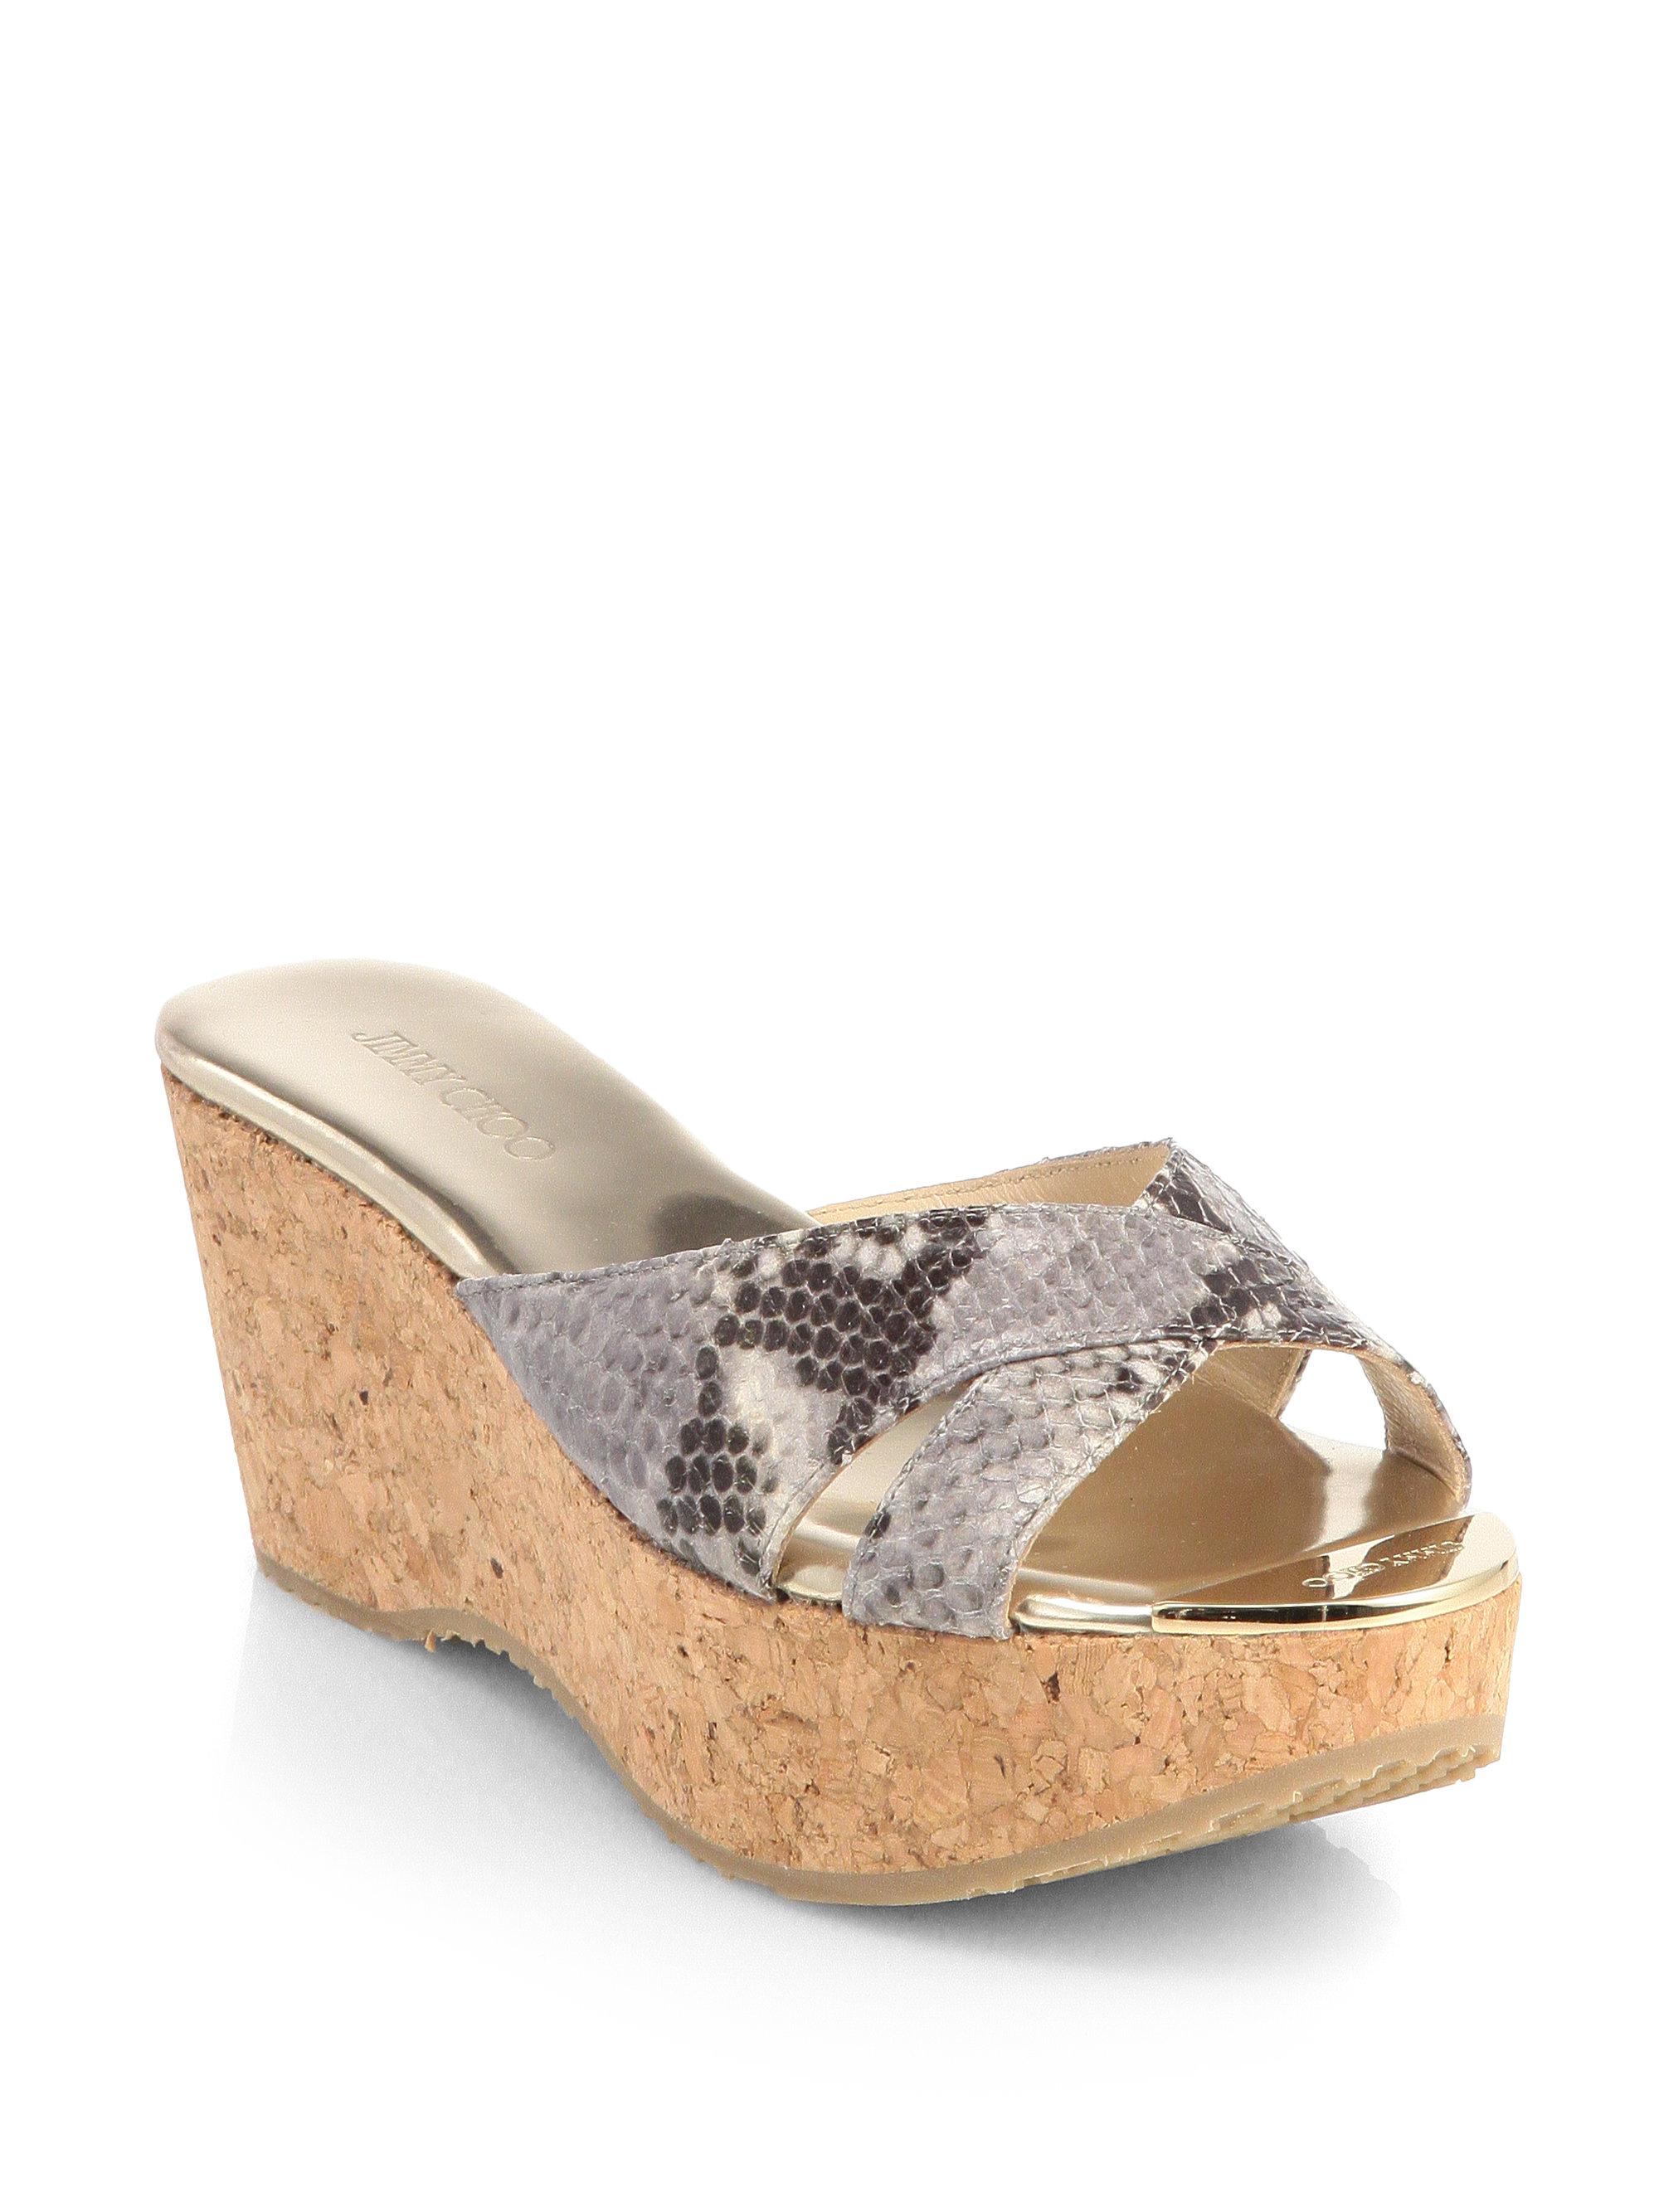 8f5a3110f1b Lyst - Jimmy Choo Prima Snakeskin Cork Wedge Sandals in Natural